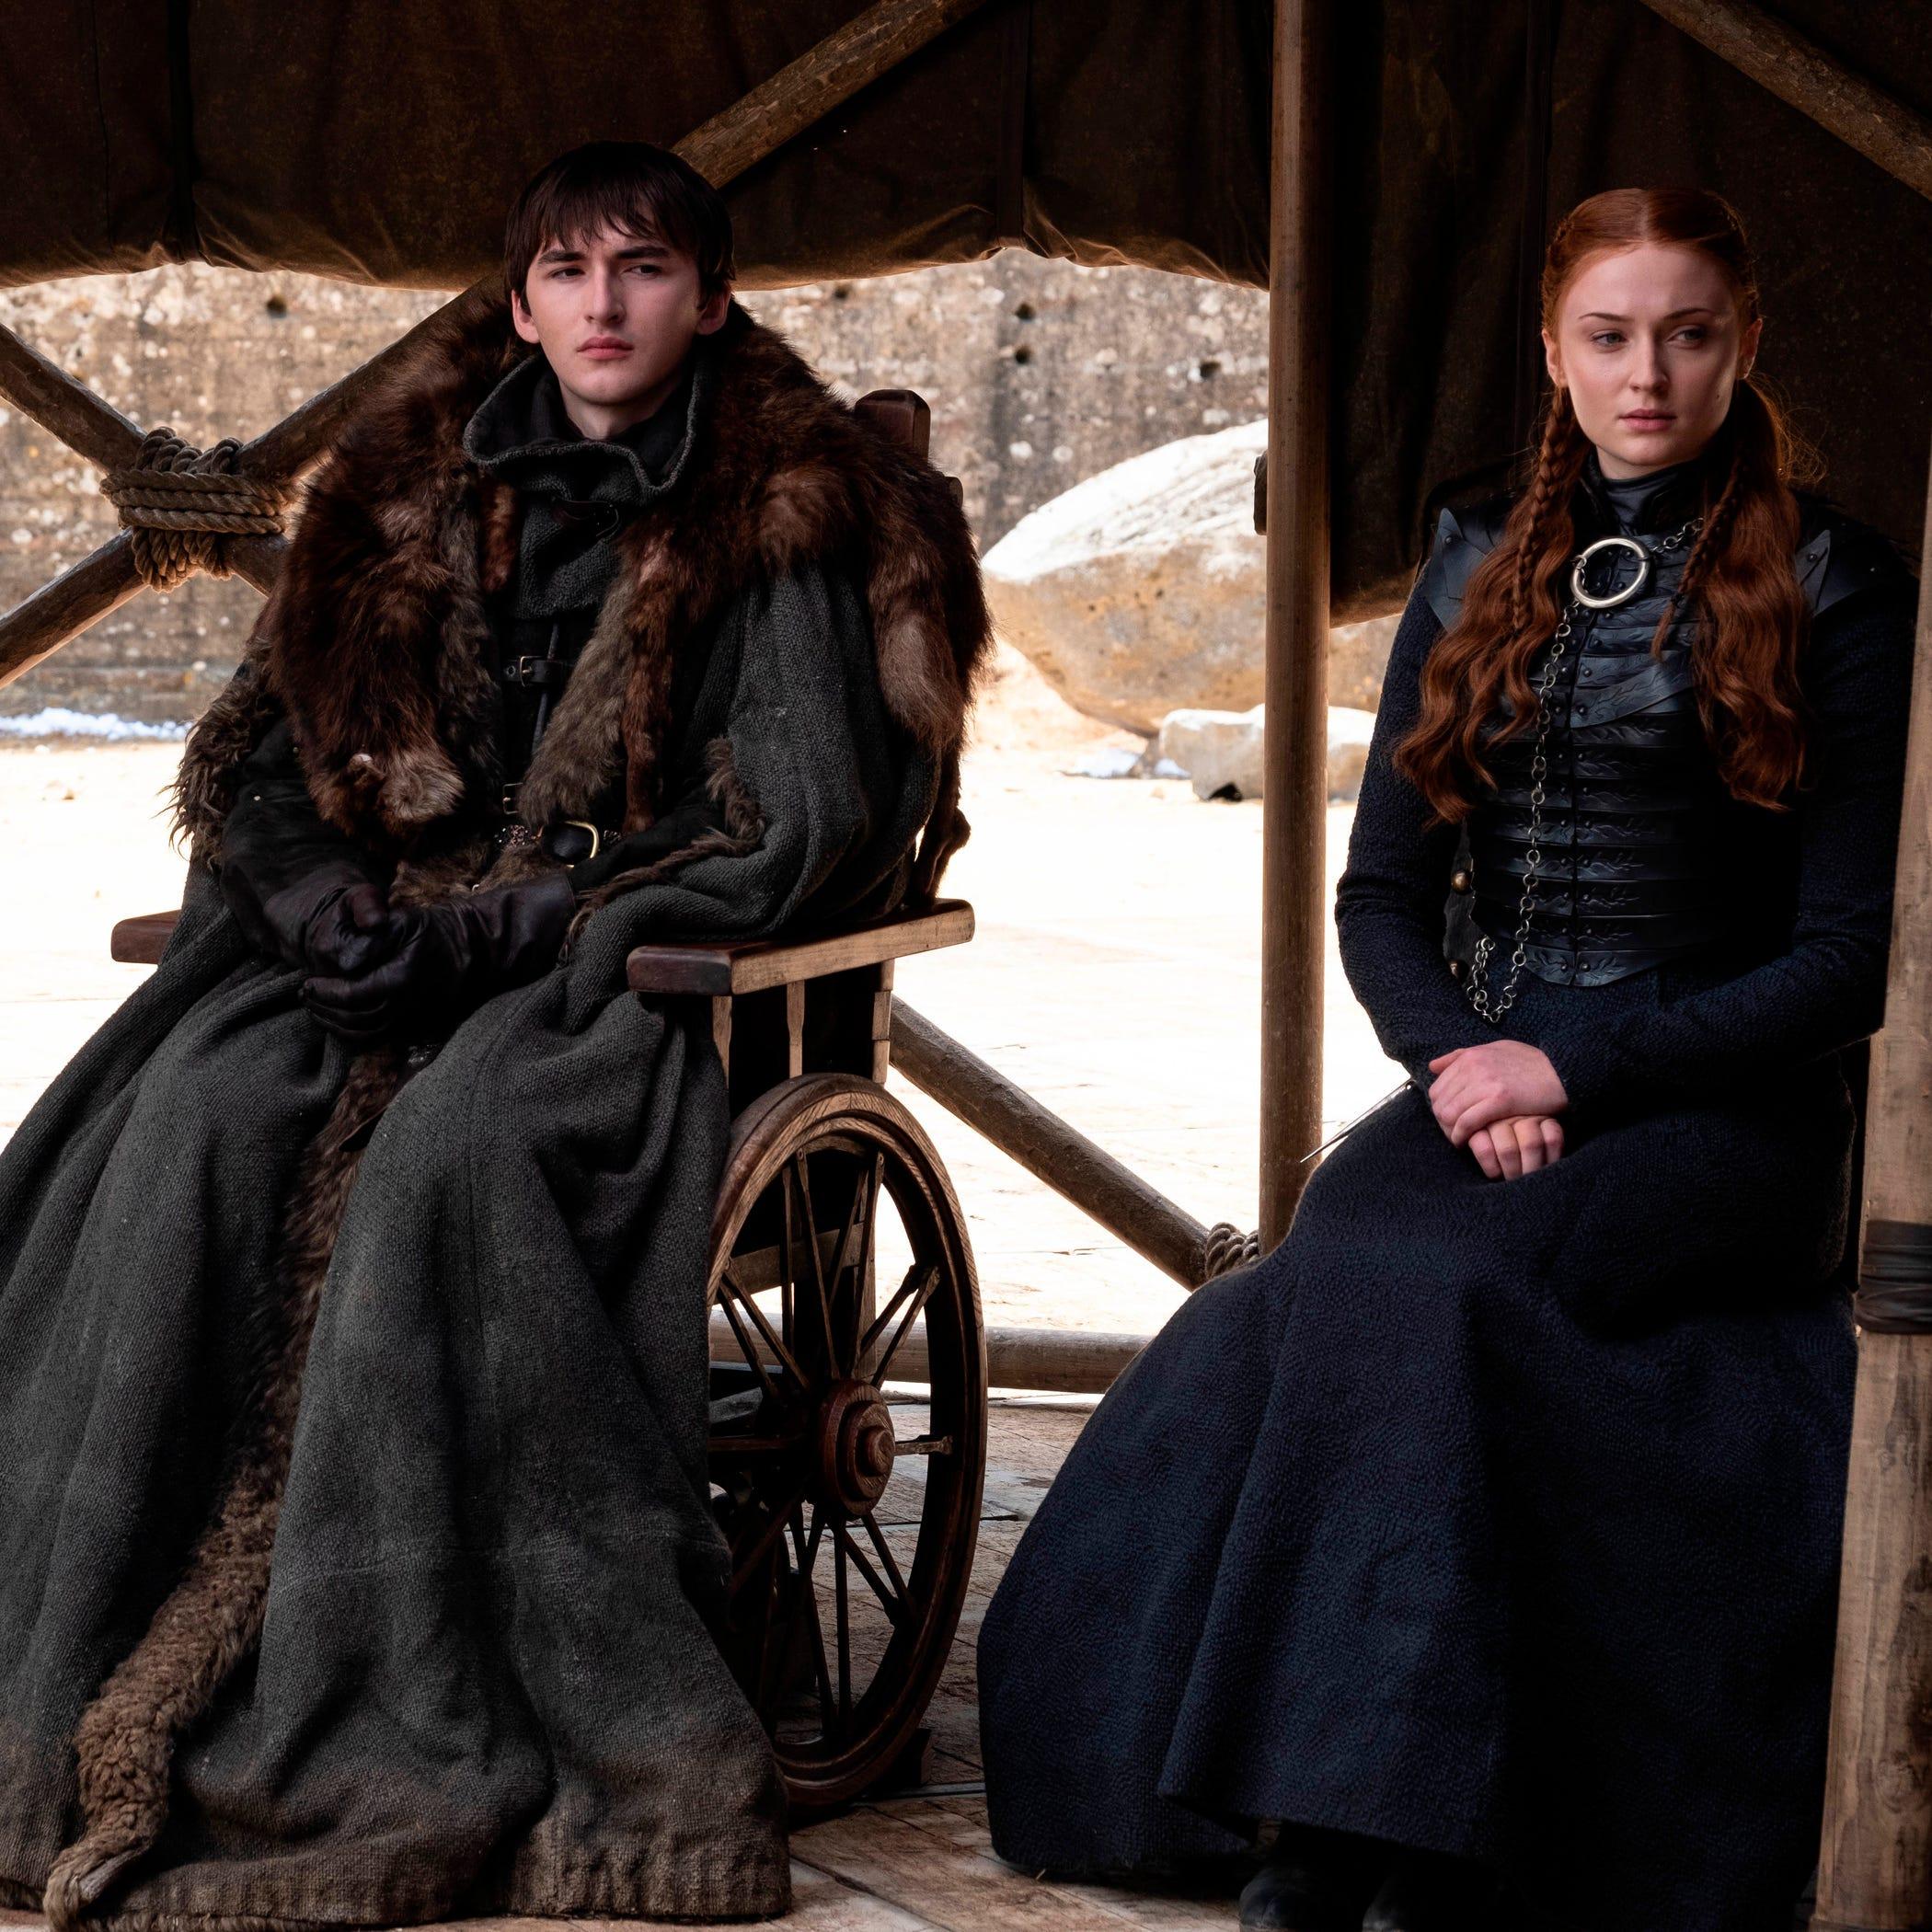 'Game of Thrones' finale: The profound message of Bran the Broken's wooden wheelchair